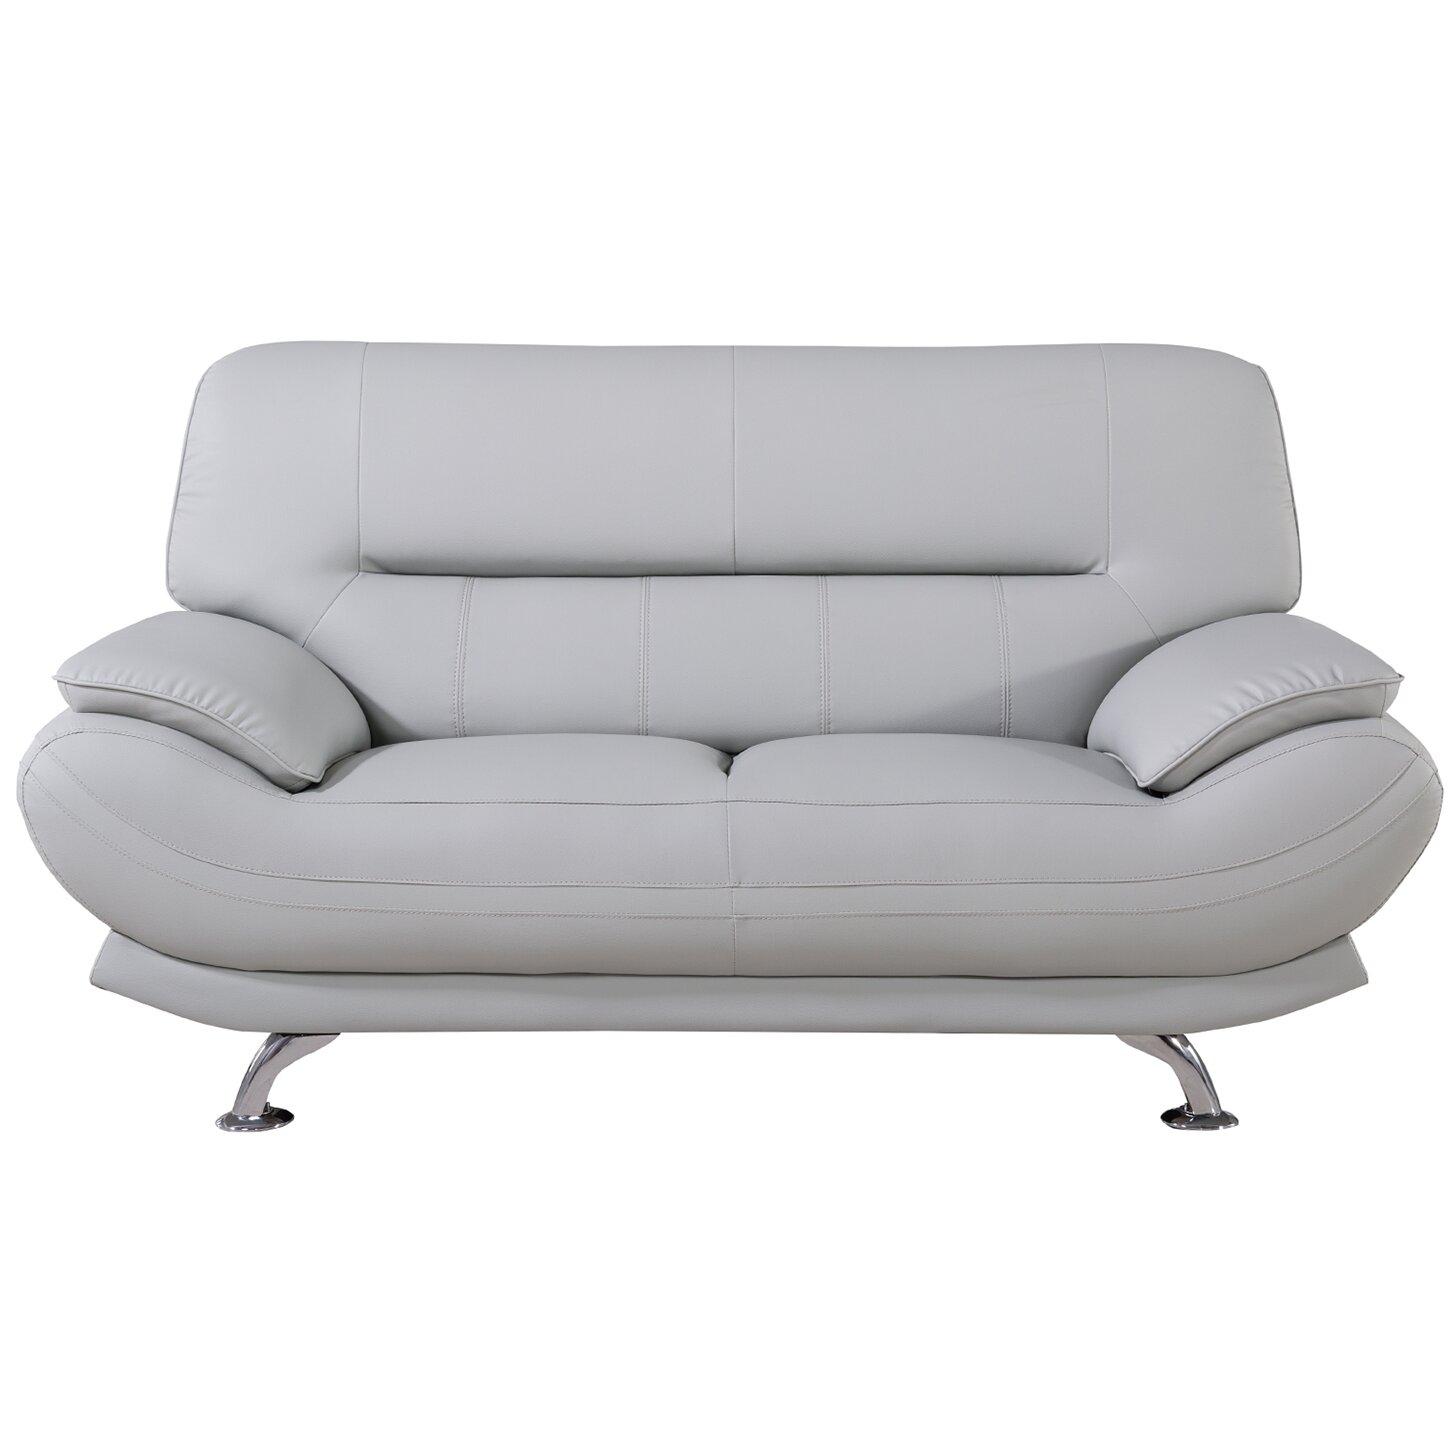 AmericanEagleInternationalTrading Mason 3 Piece Living Room Set